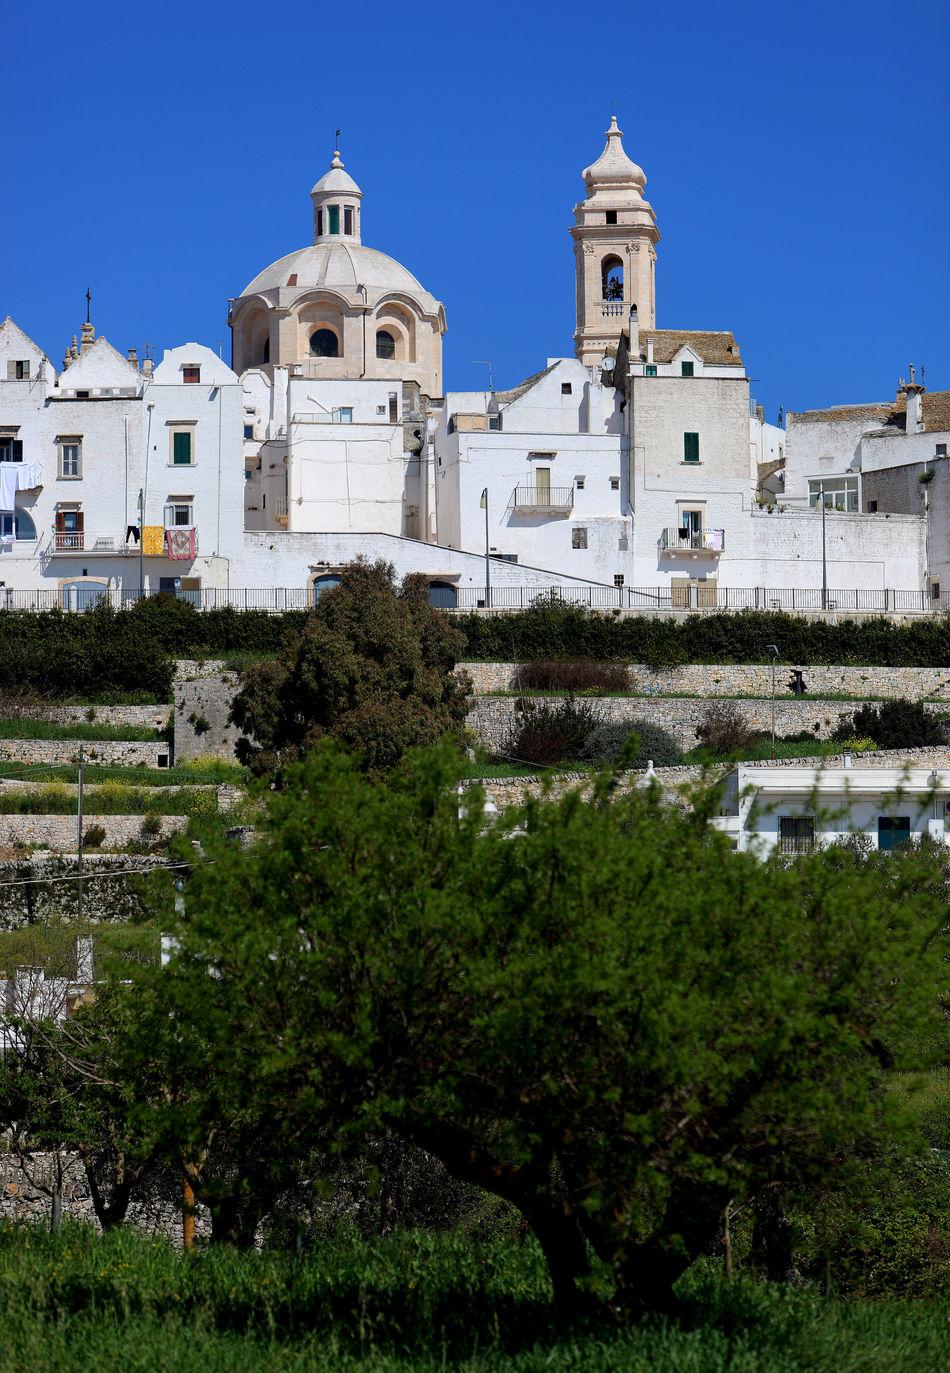 Skyline of Locorotondo, Puglia, Italy Architecture Building Exterior Built Structure Day Italy Locorotondo No People Outdoors Puglia Sky